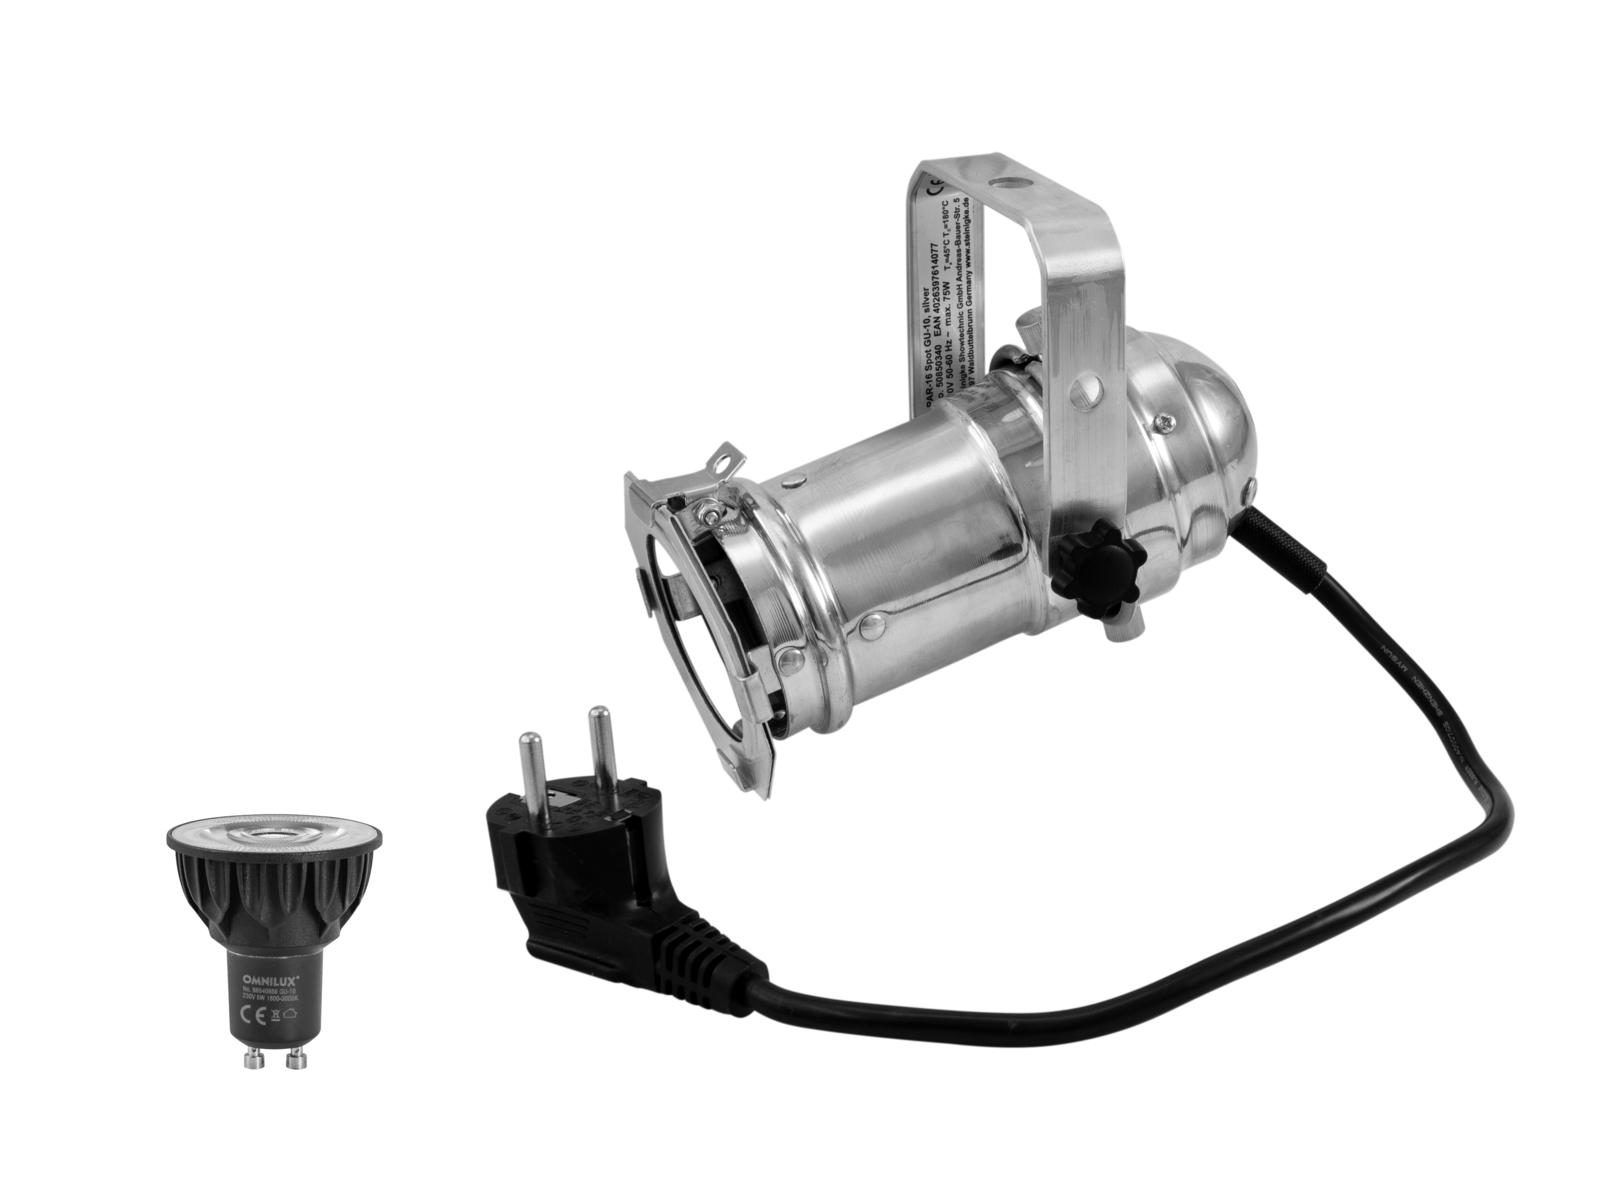 EUROLITE Set PAR-16 Spot sil + GU-10 230V COB 5W LED 1800-3000K dim2warm